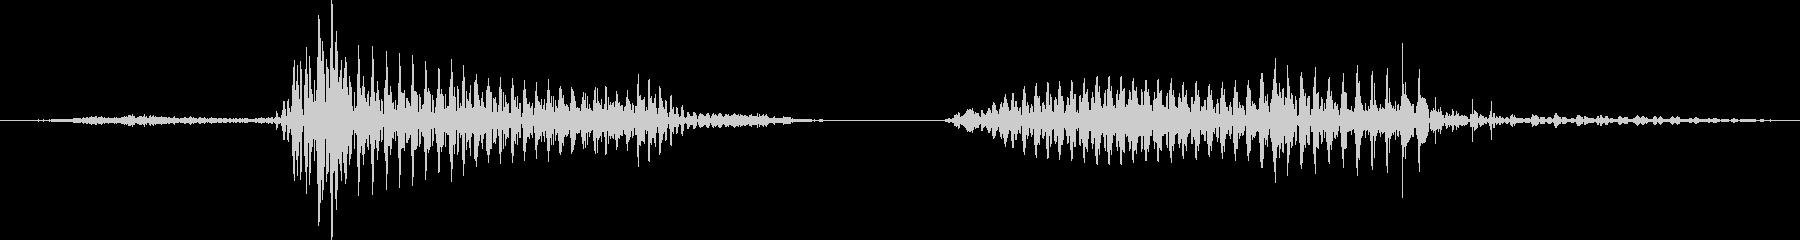 「5 PM」英語発音の未再生の波形